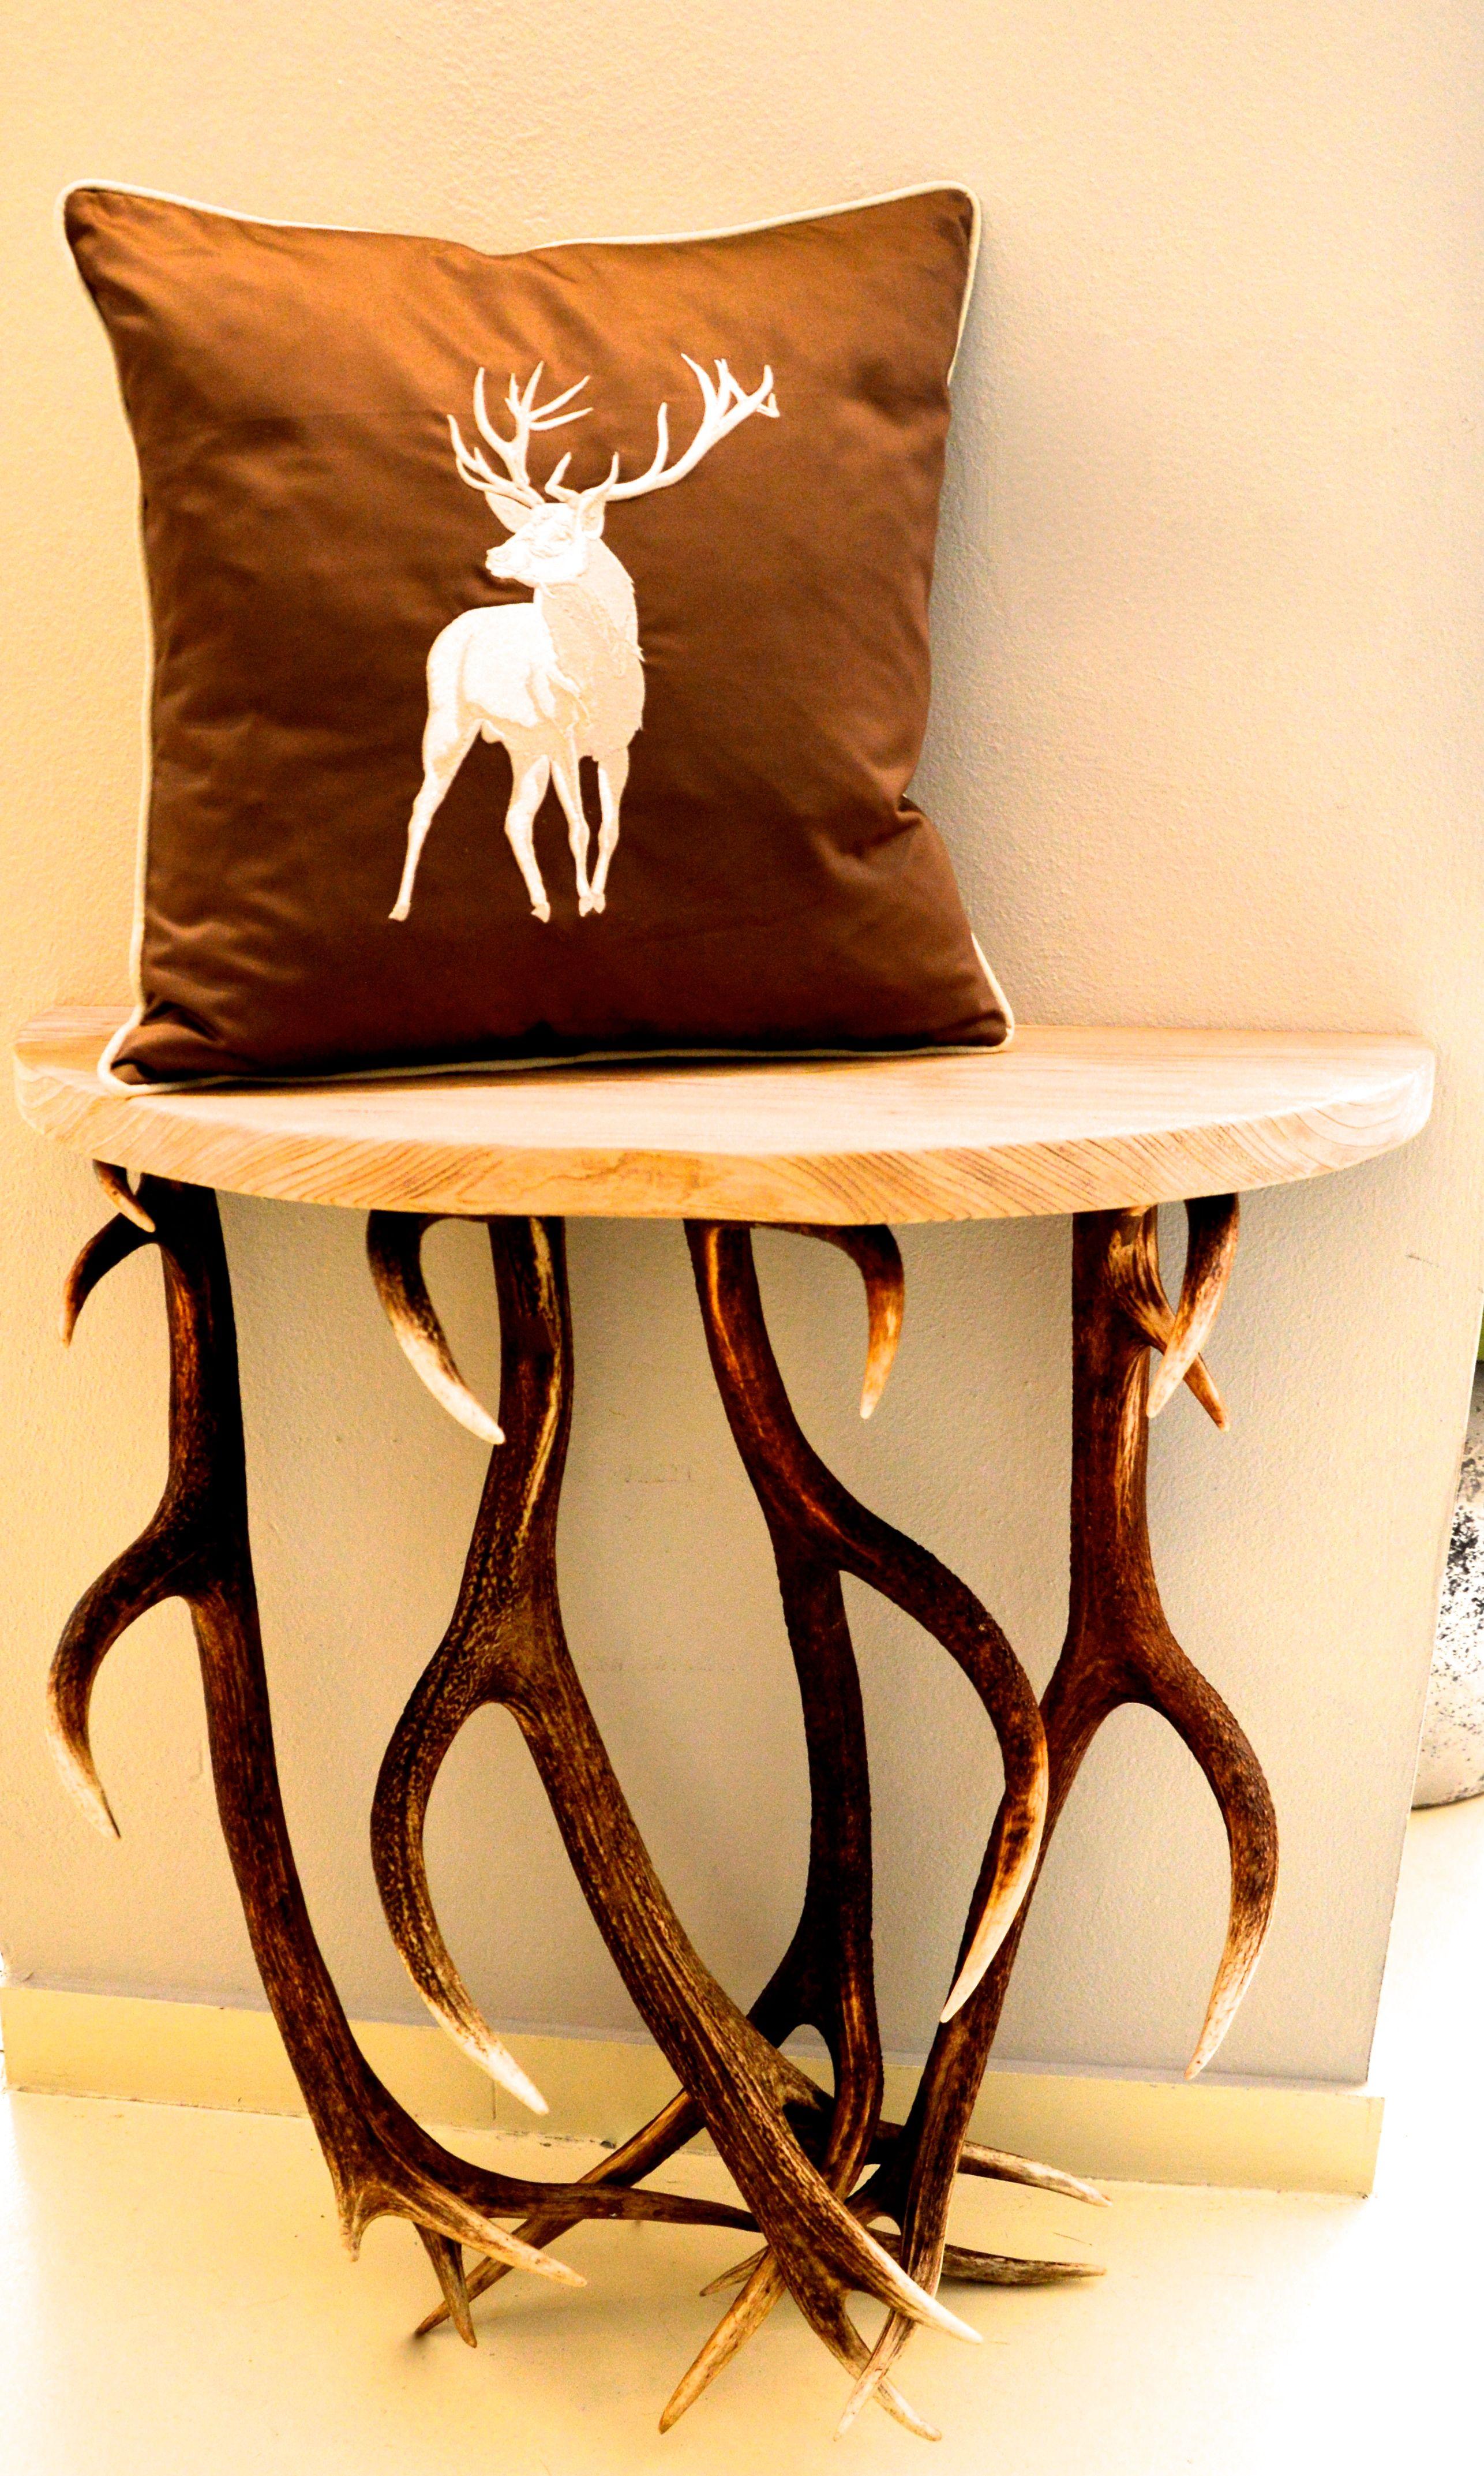 le fineza meran merano home interior chalet design deko. Black Bedroom Furniture Sets. Home Design Ideas